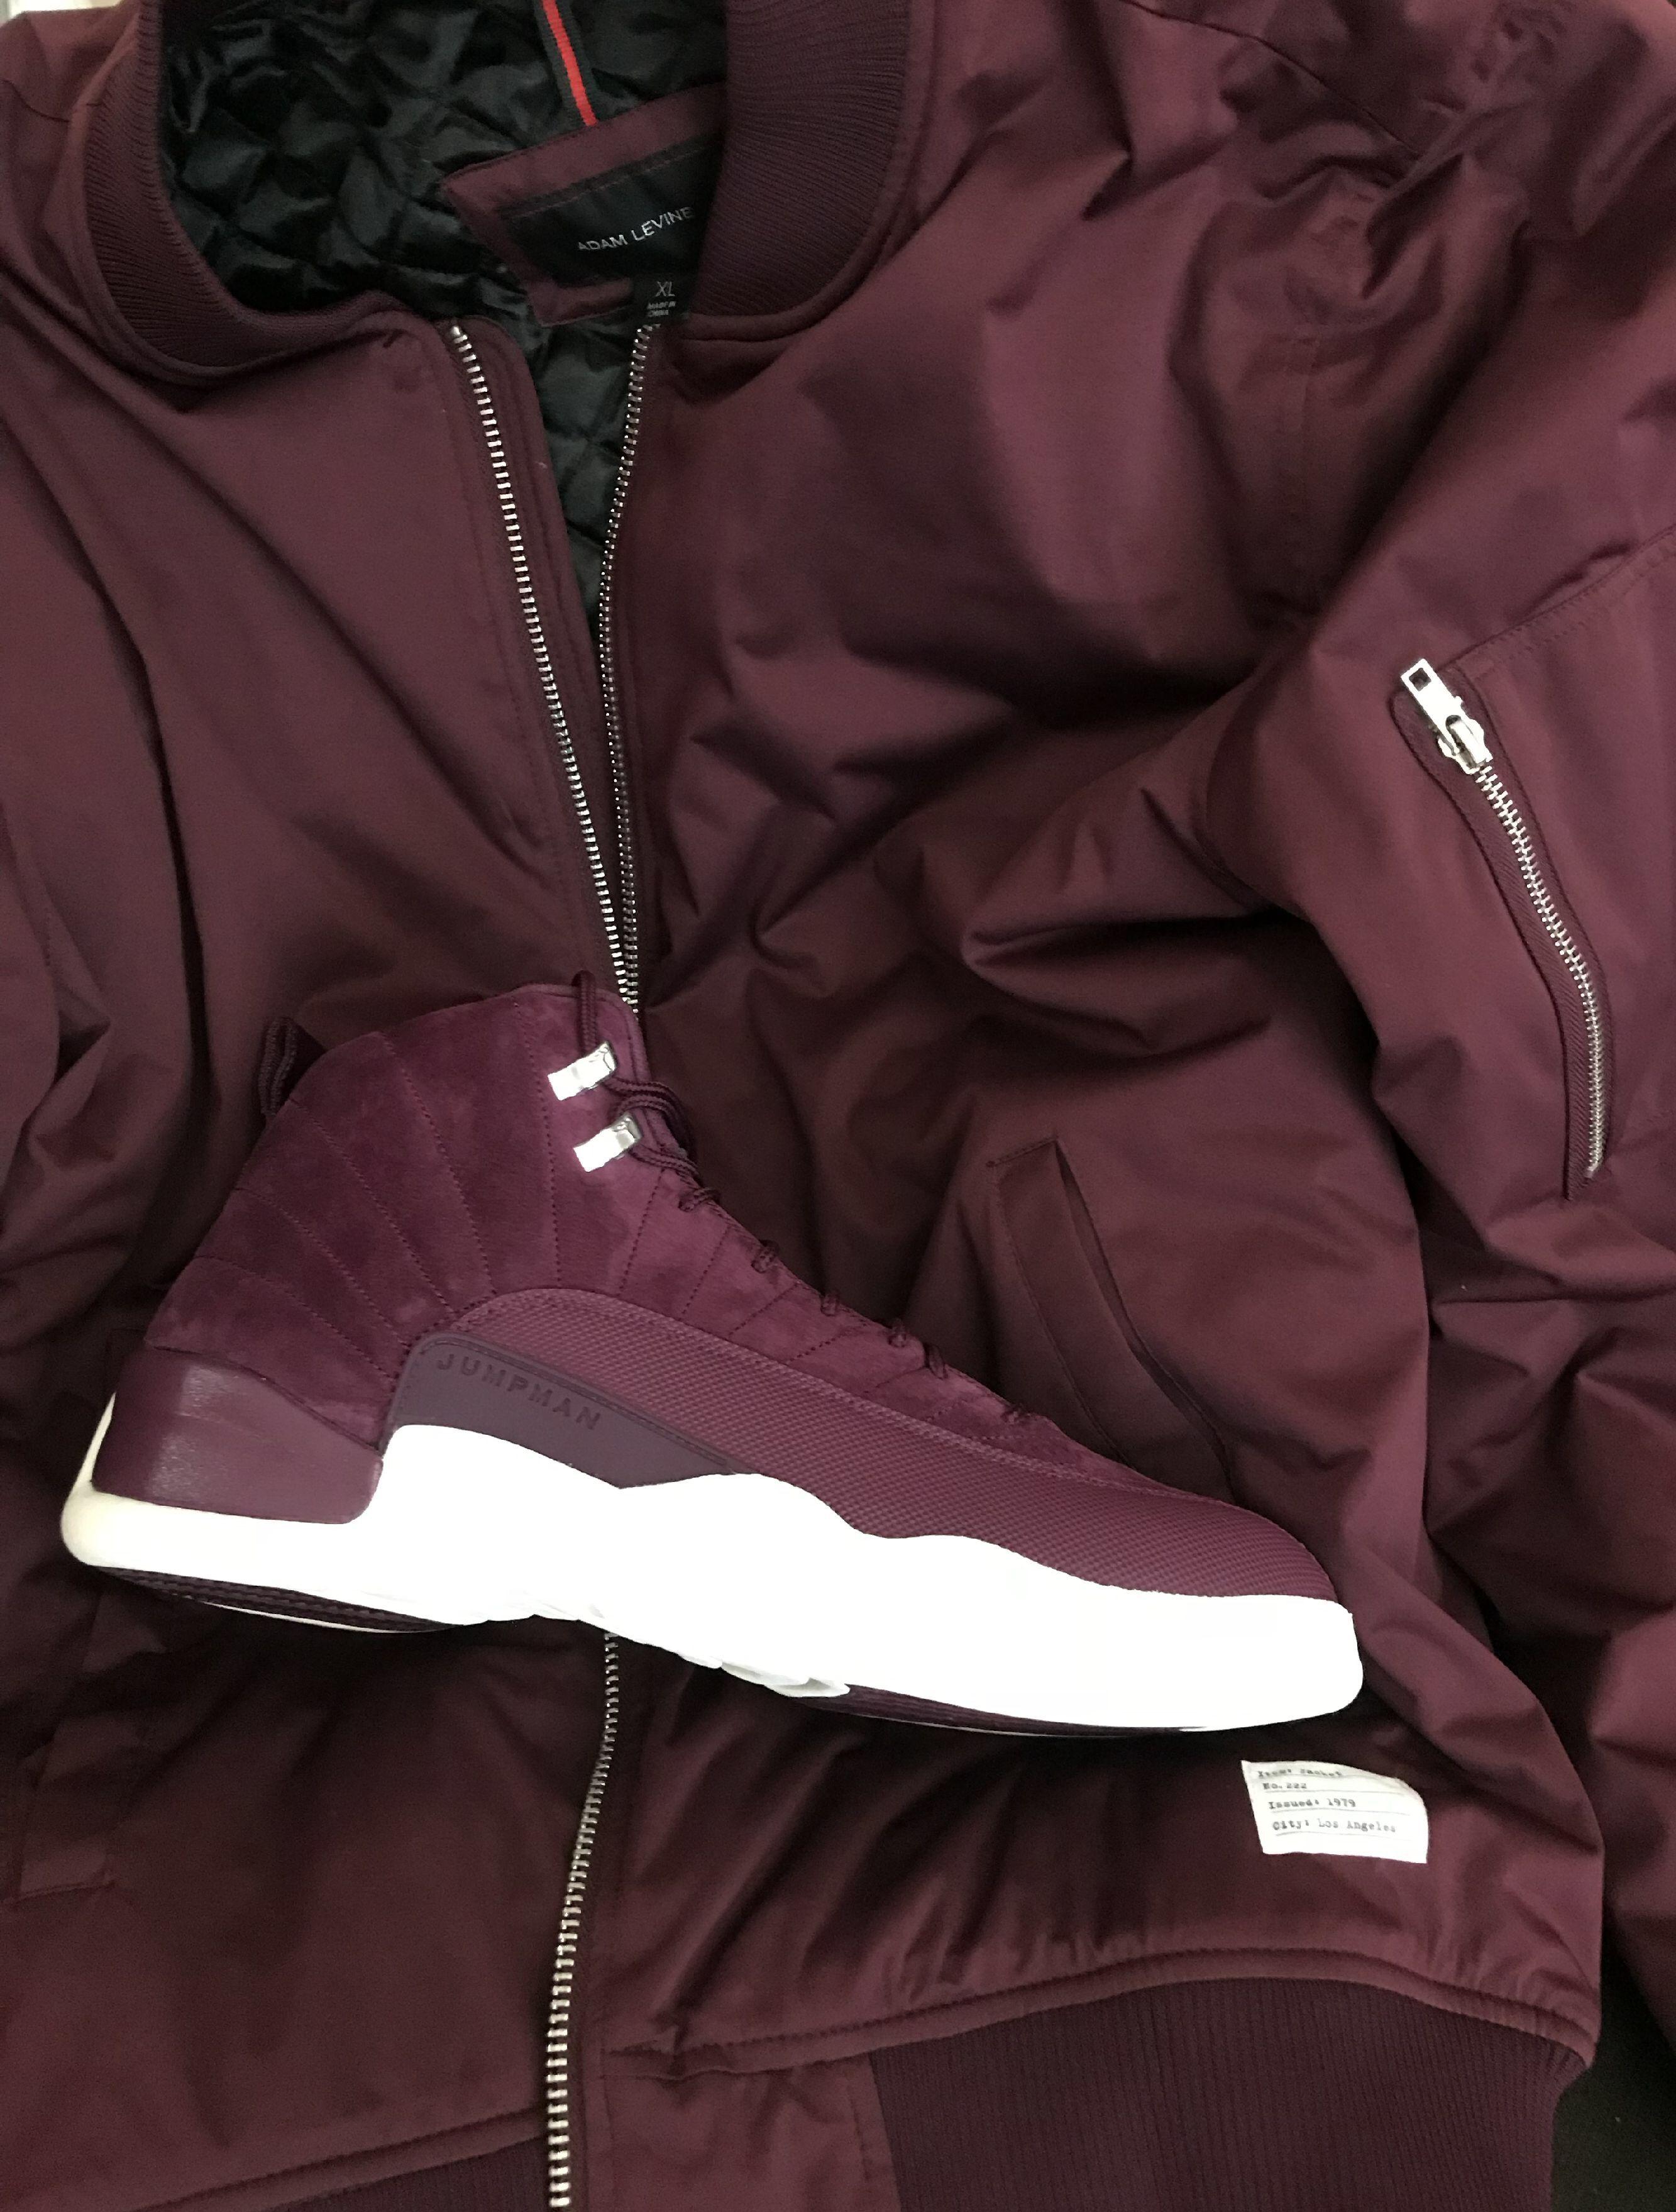 new style 1454c 632cd Jordan Retro 12 - Bordeaux. #kotd #fashion #picoftheday ...